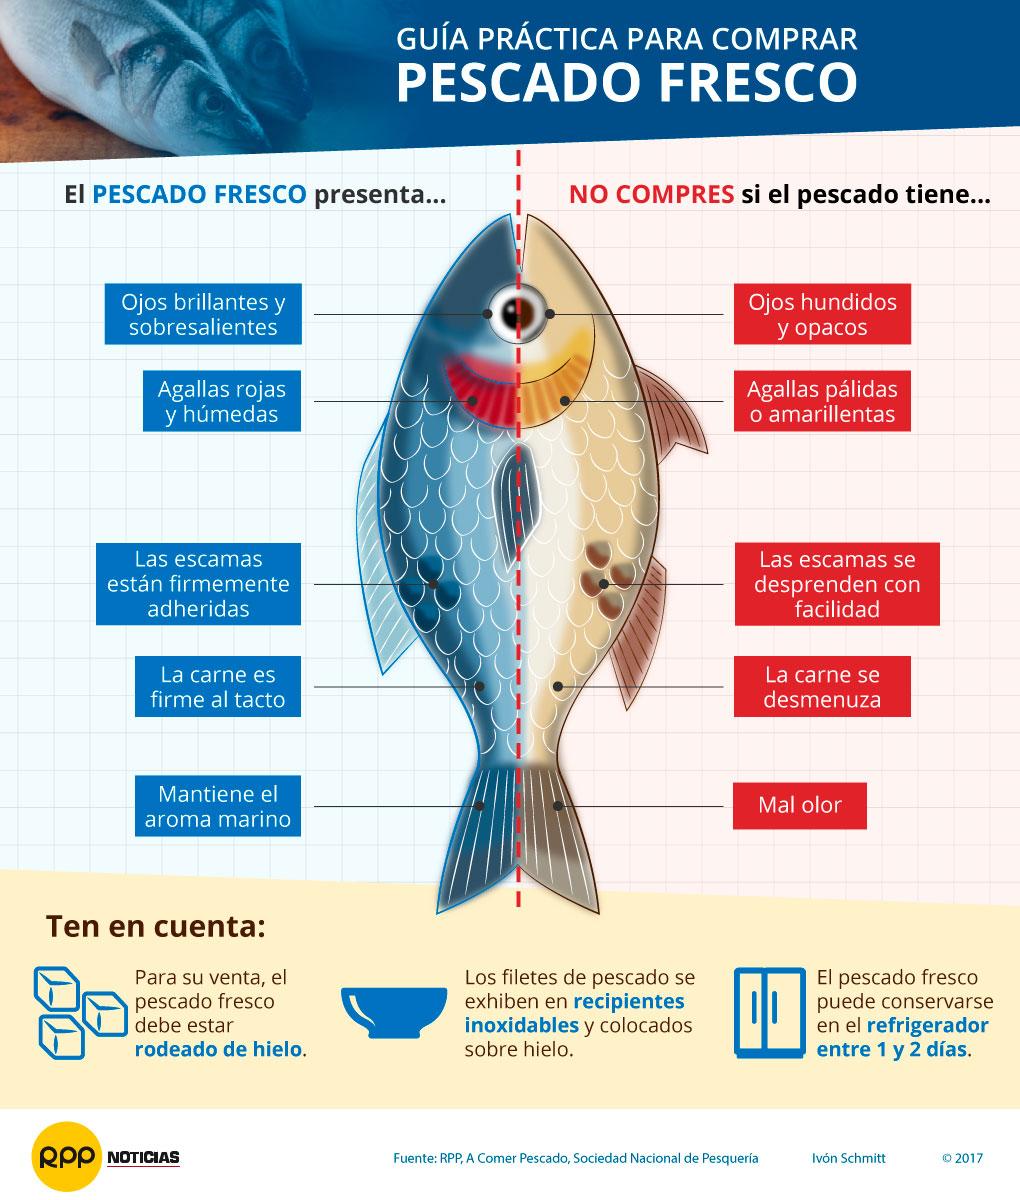 Guía para saber cuándo un pescado es fresco